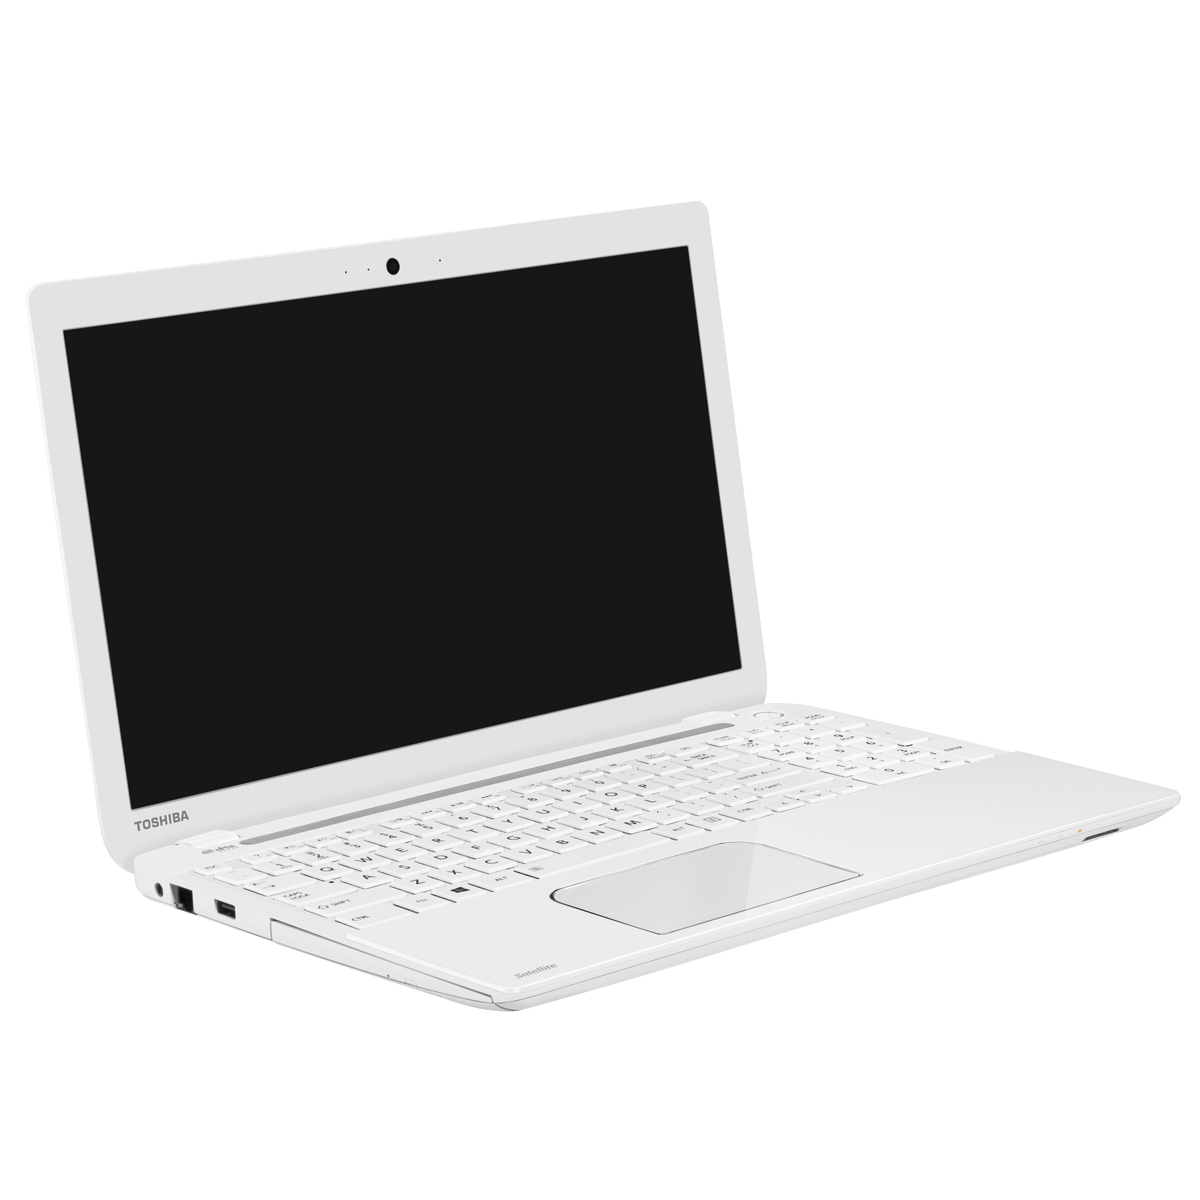 "PC portable Toshiba Satellite L50-A-1DG Intel Core i7-4700MQ 4 Go 750 Go 15.6"" LED NVIDIA GeForce GT 740M Graveur DVD Wi-Fi N/Bluetooth Webcam Windows 8.1 64 bits"